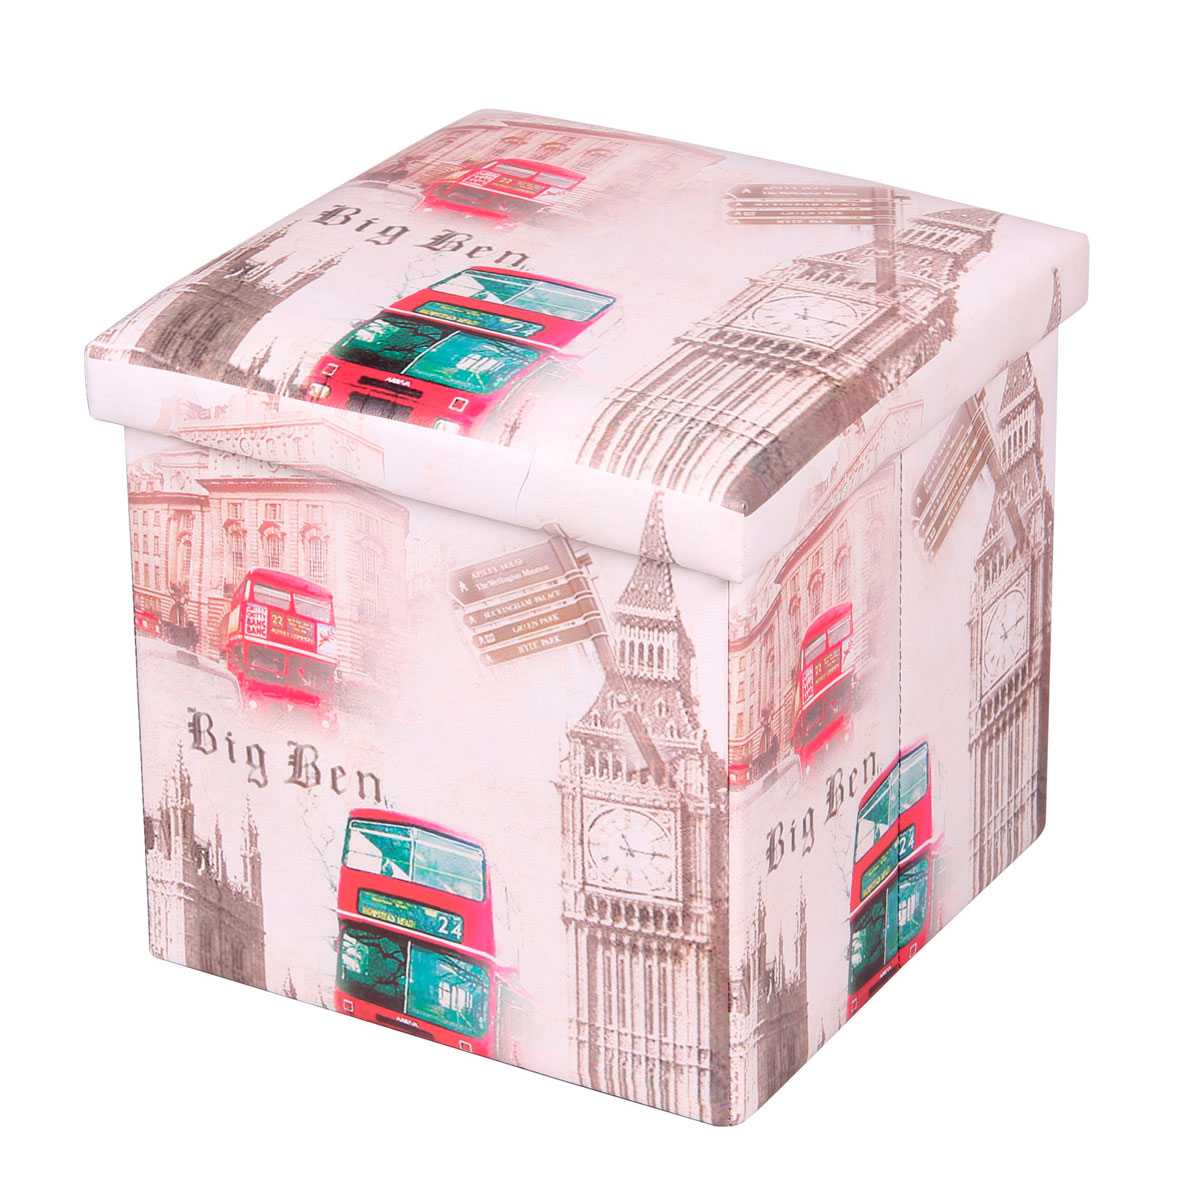 Пуф-короб для xранения Miolla, цвет: белый, красный, коричневый, 38 x 38 x 38 см. PSS-13 короб для xранения miolla круги 30 x 40 x 18 см sbb 04